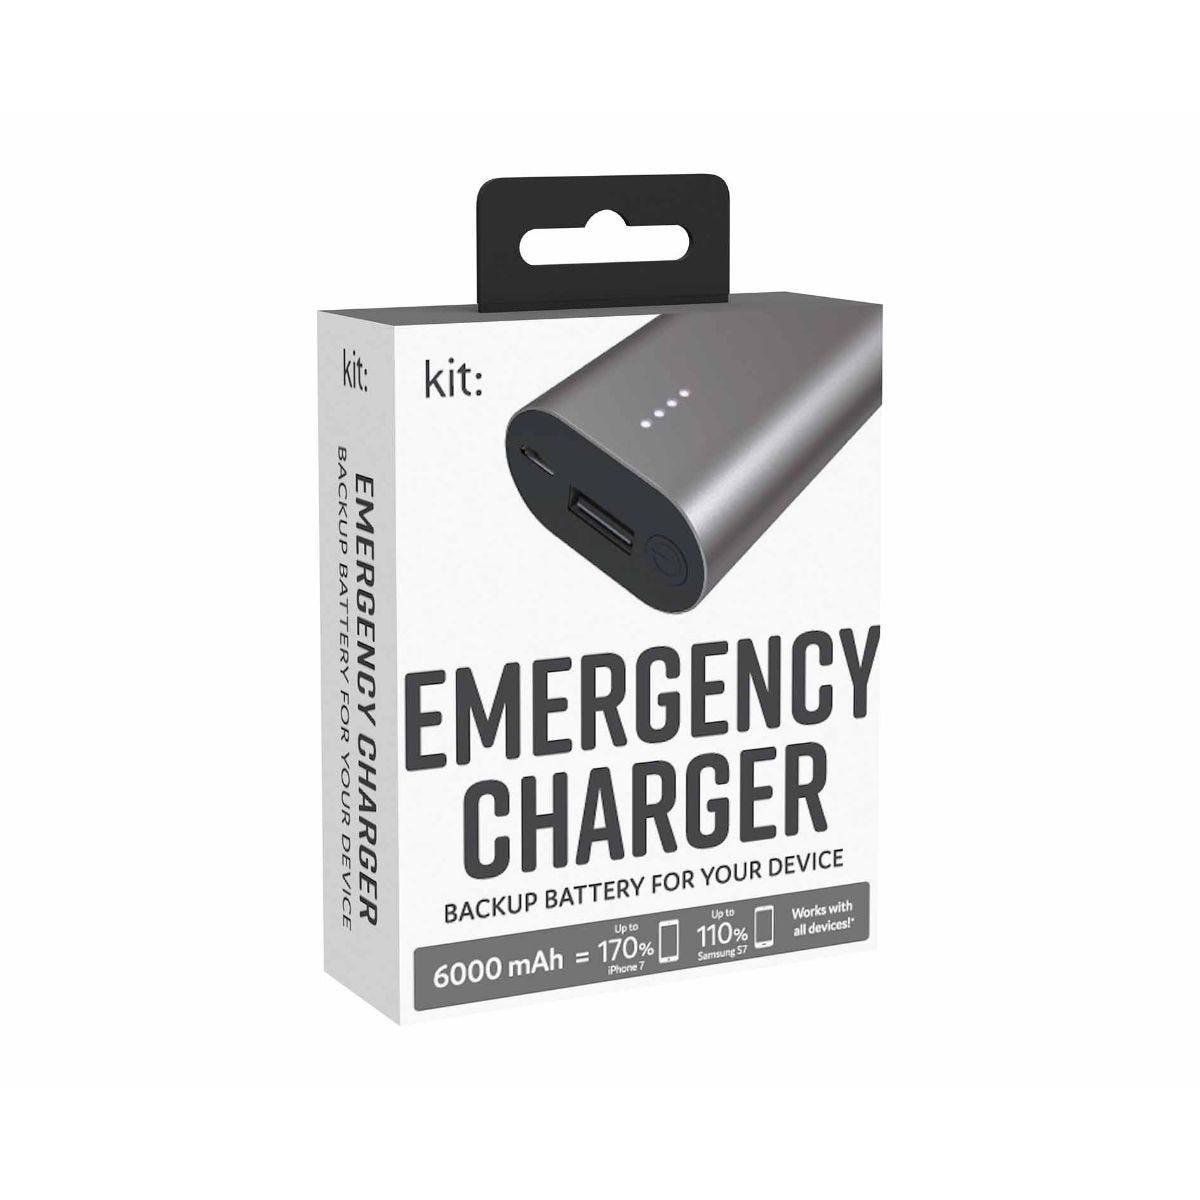 Kit Premium Emergency Charger 6000mAh